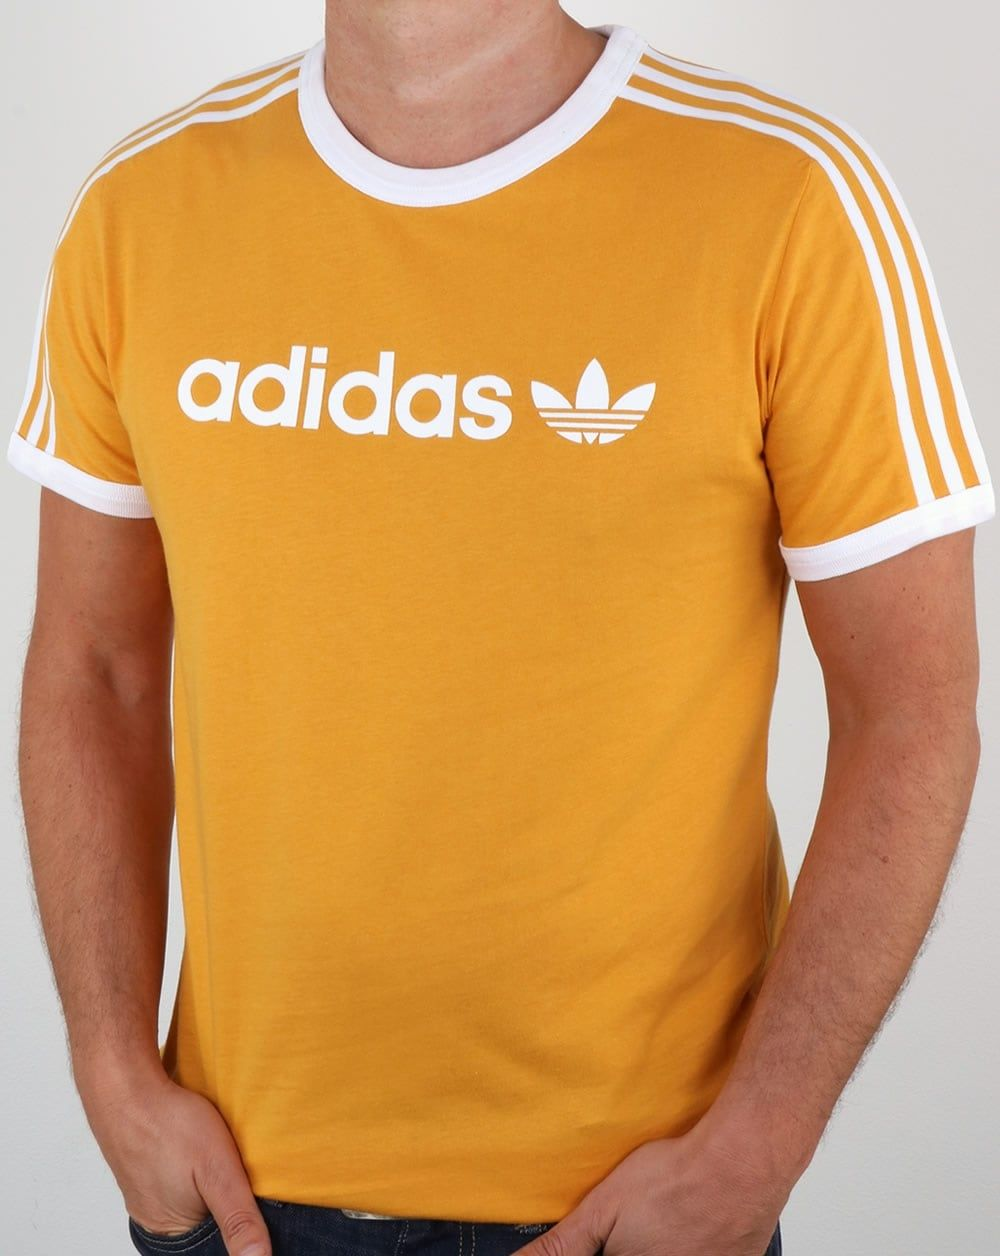 Adidas Originals Trefoil 3 Stripes T shirt Bold BlueYellow